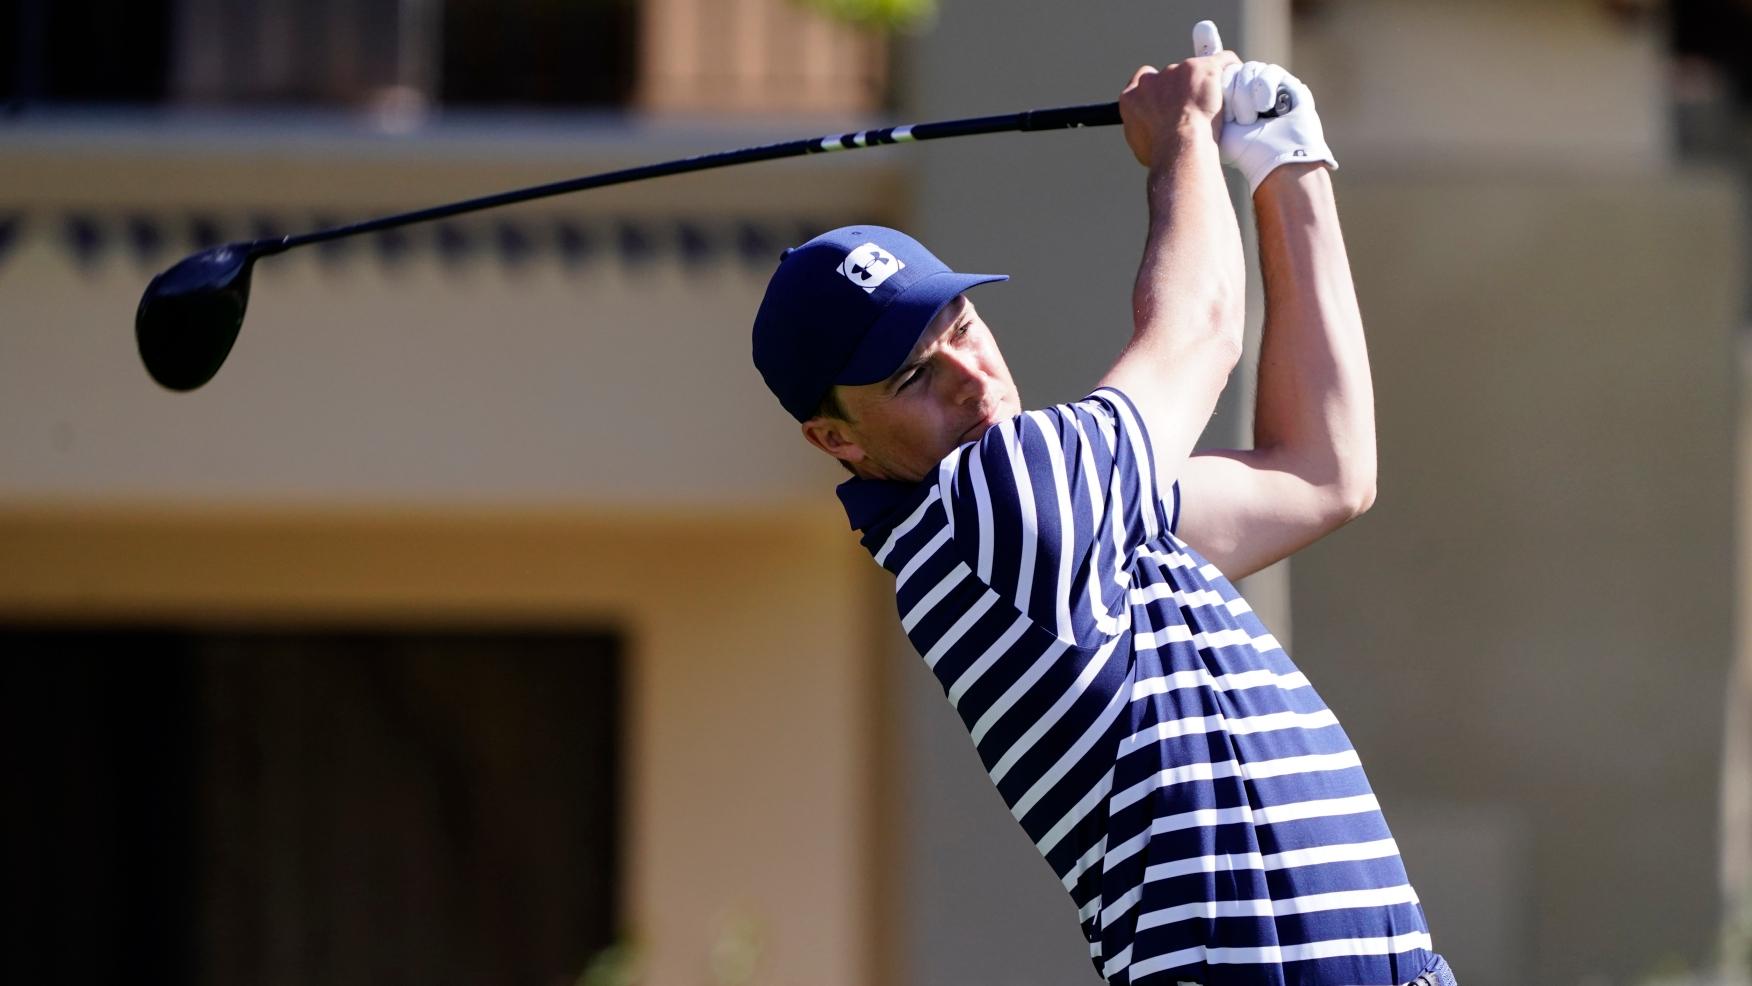 Jordan Spieth memulai lima putaran terakhir Phoenix Open pada 7/2.  Foto: AP